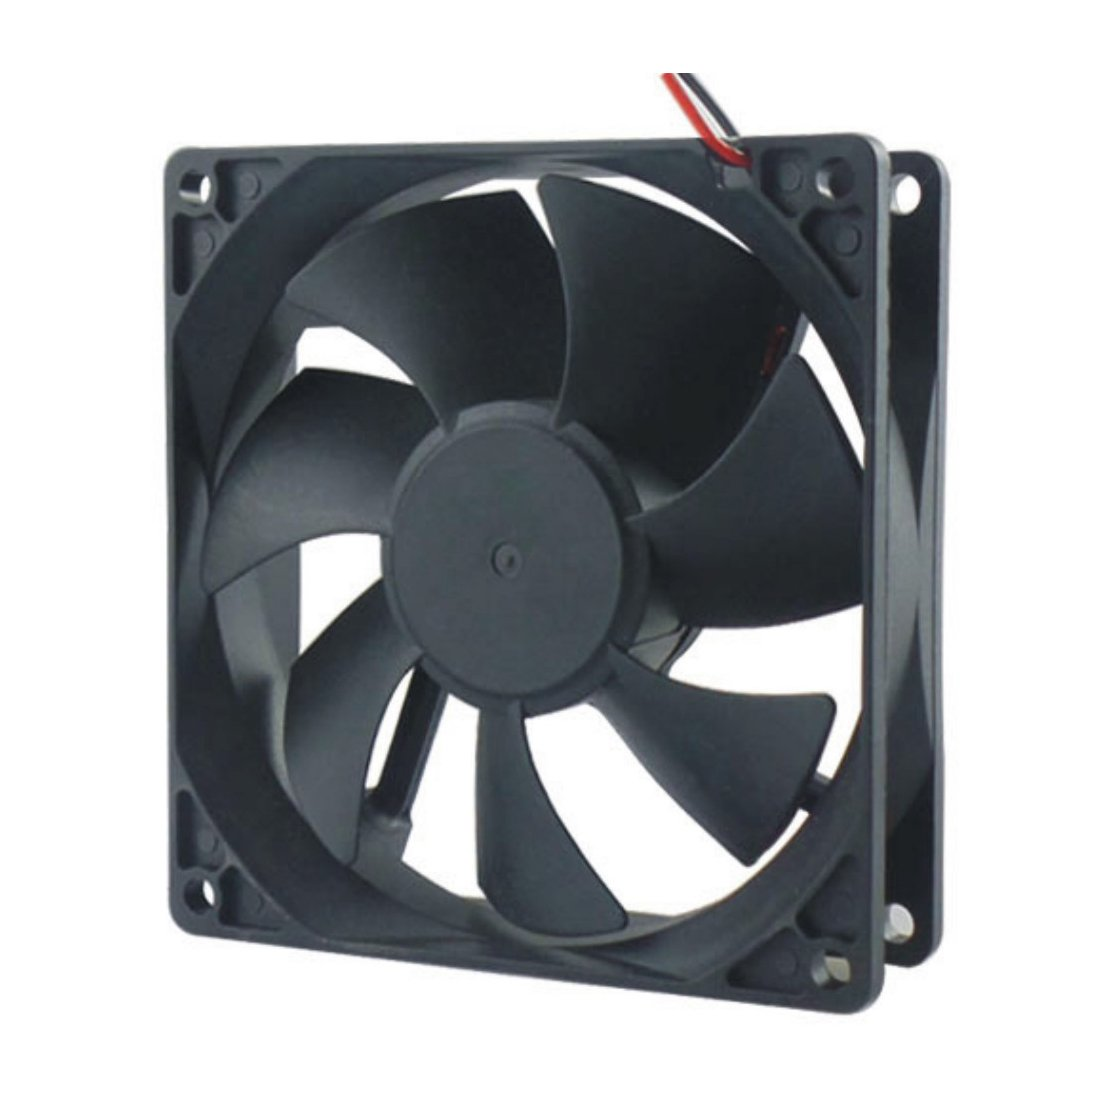 WINGONEER 120 x 120 x 38mm 12038 0.52A DC12V Ball bearing DC Cooling Fan 3pin WINGONEER®